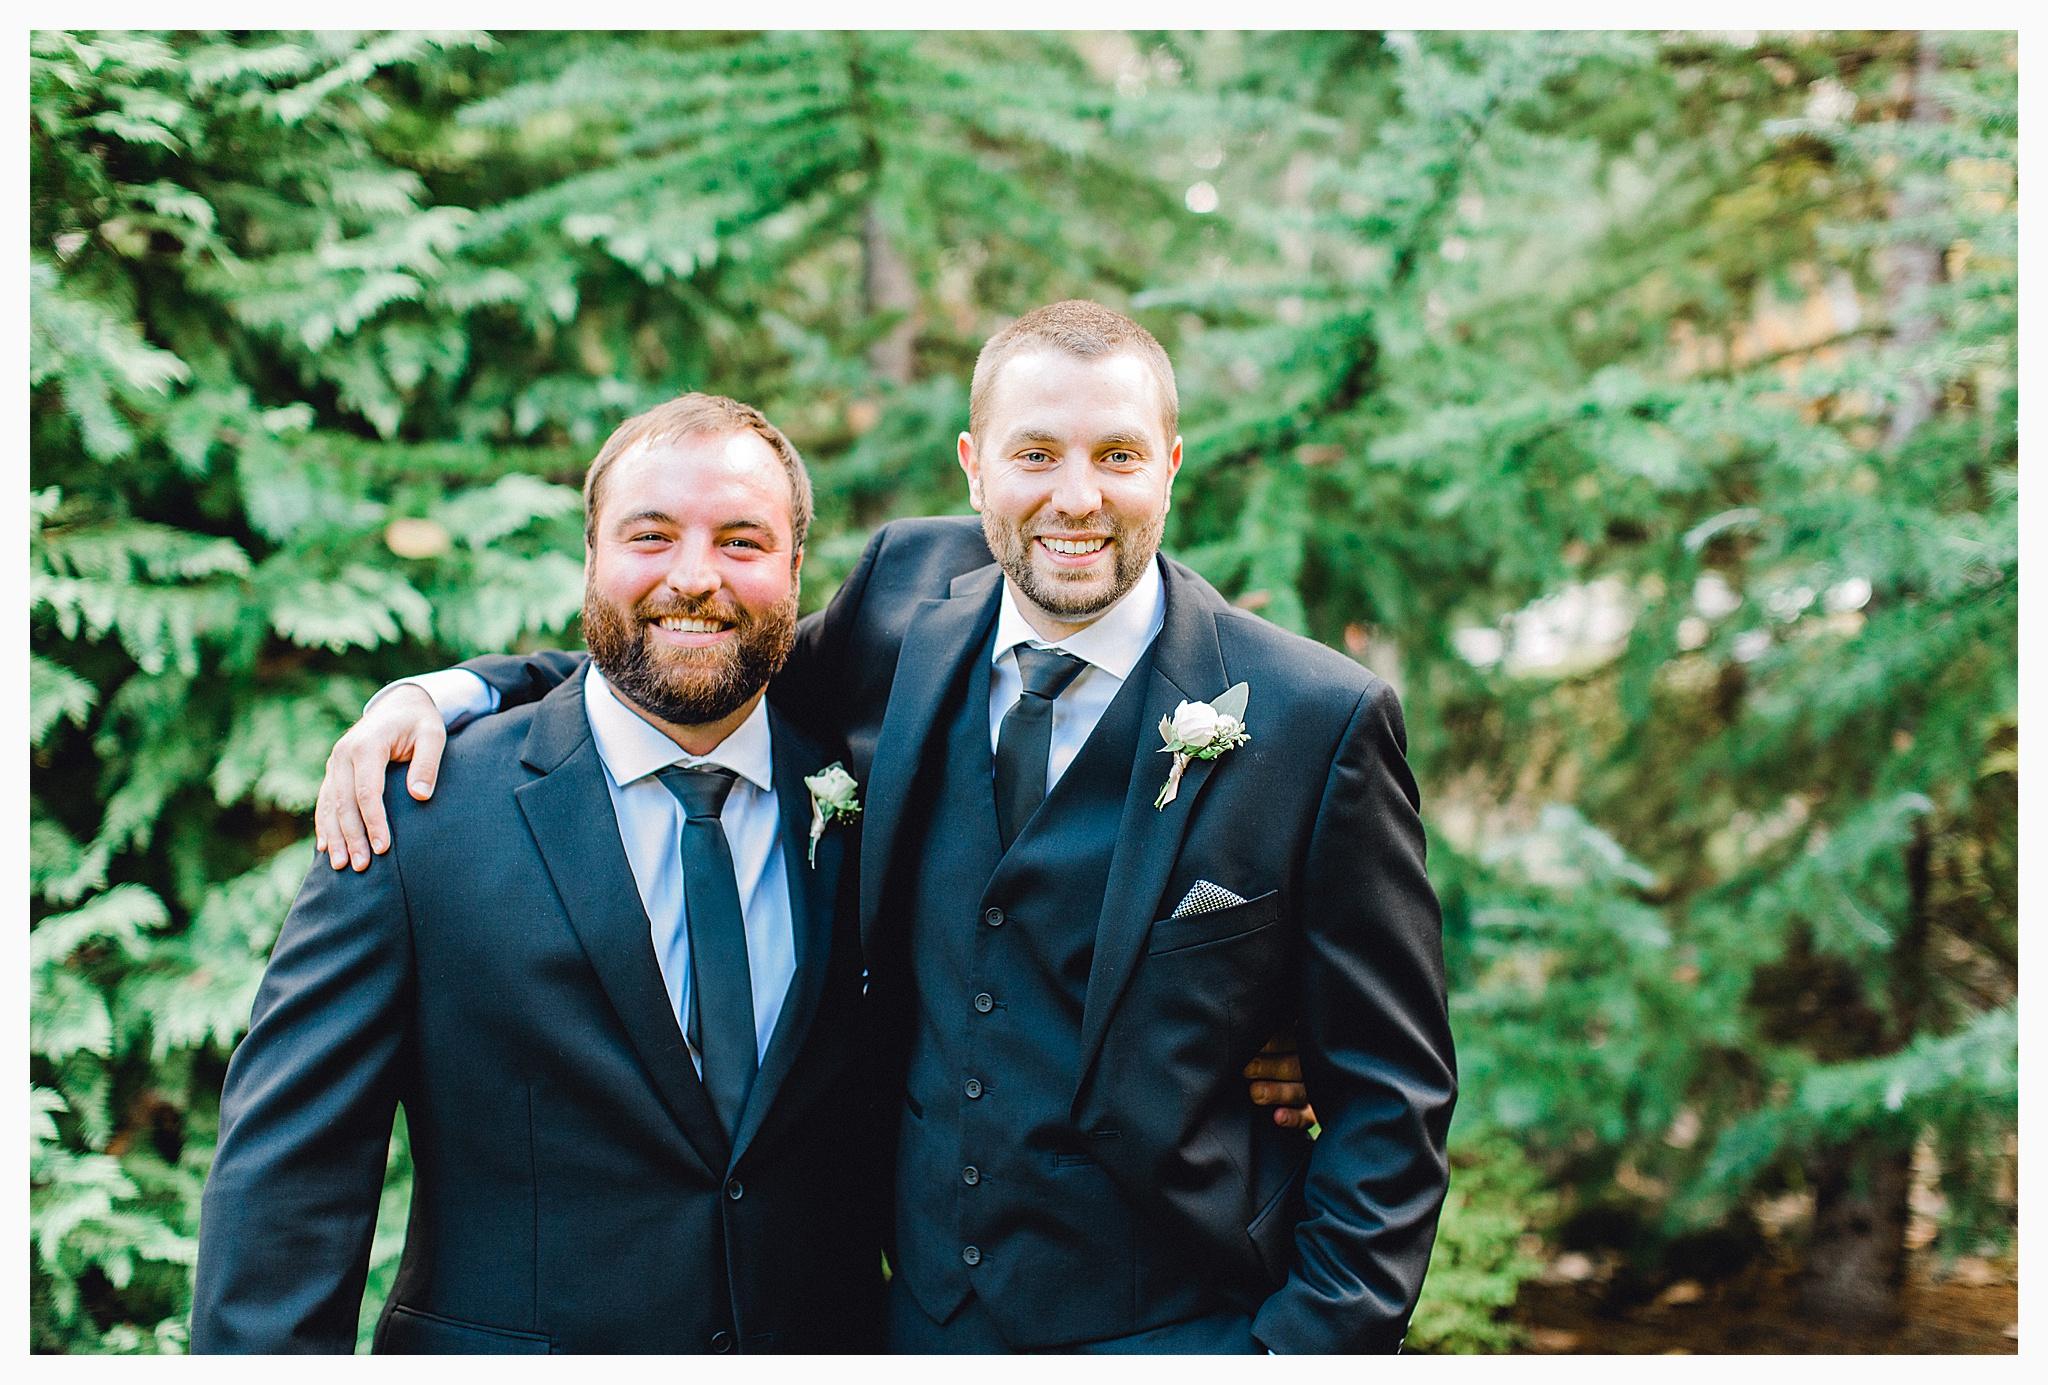 Emma Rose Company Light and Airy Wedding Photographer, Beautiful fall wedding at Rock Creek Gardens Venue in Puyallup, Washington._0049.jpg